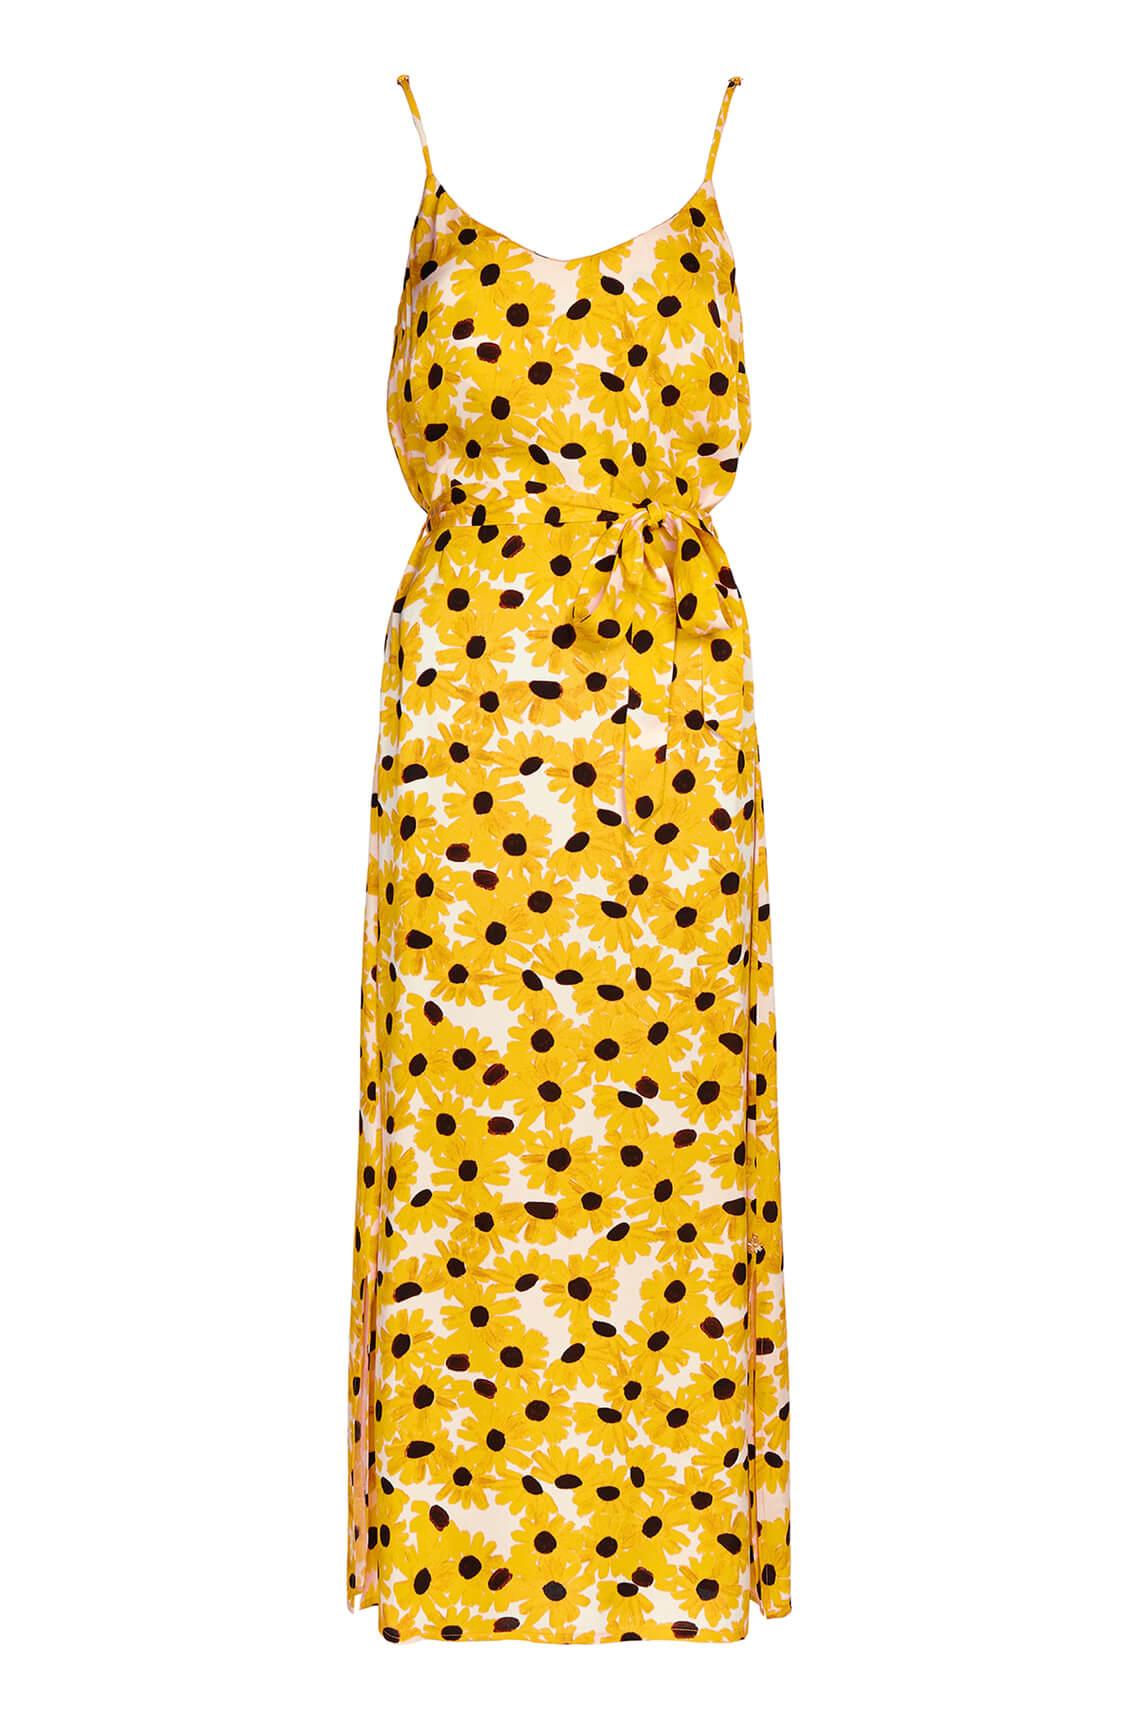 Fabienne Chapot Dames Sun Set jurk geel